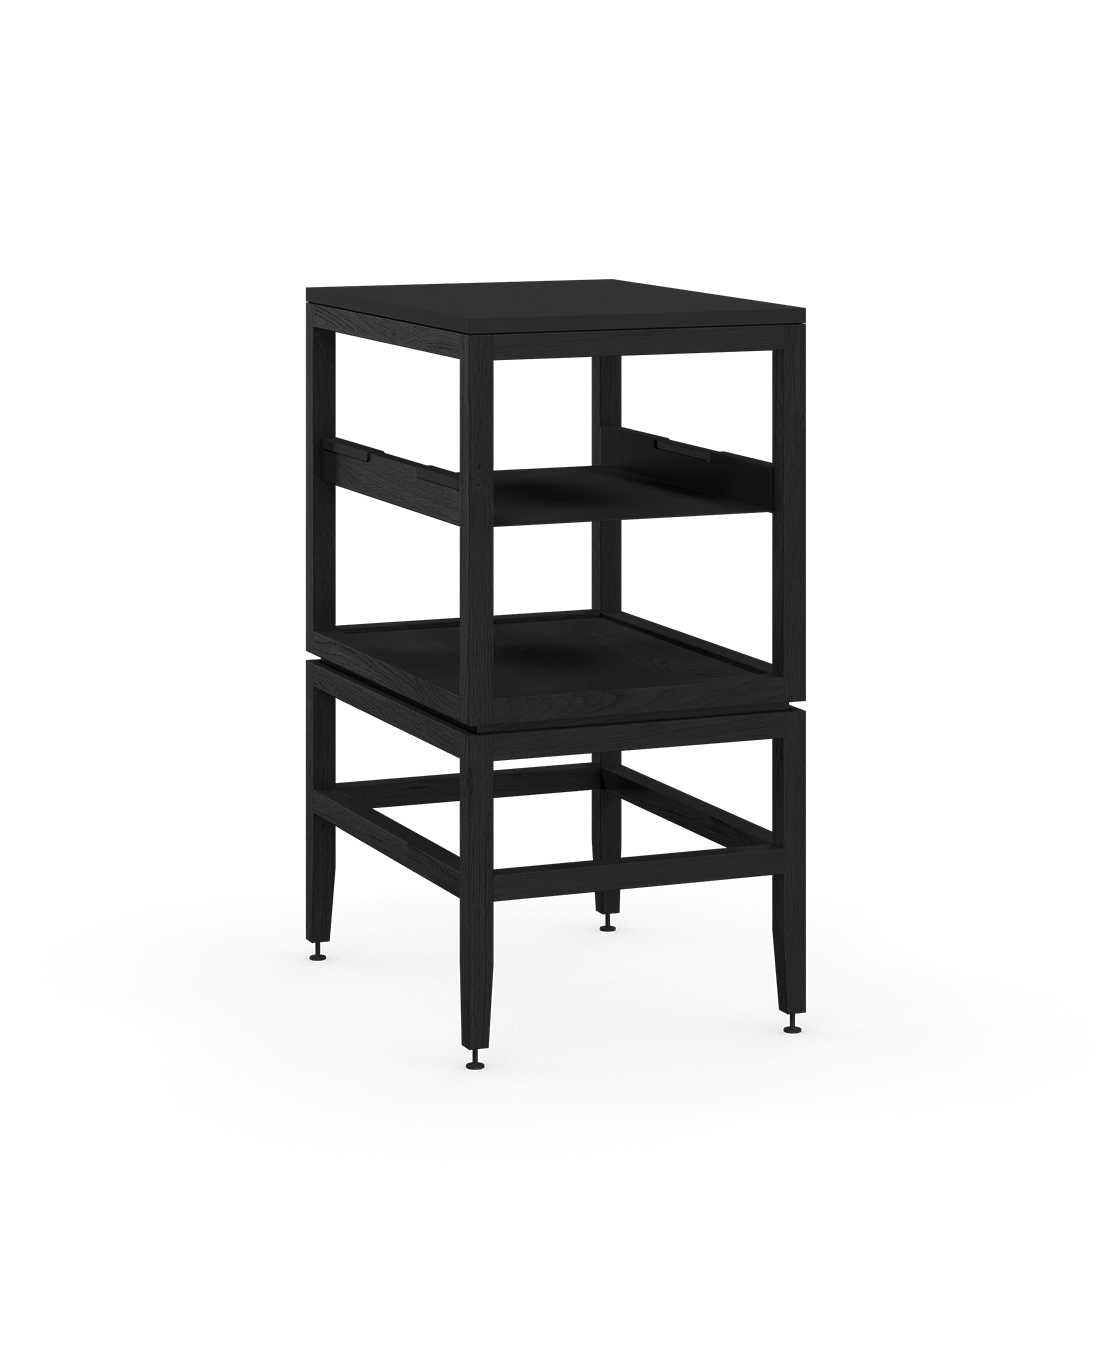 coquo volitare midnight black stained oak solid wood modular cube 1 shelf storage open cabinet 18 inch C2-N-1824-0012-BK